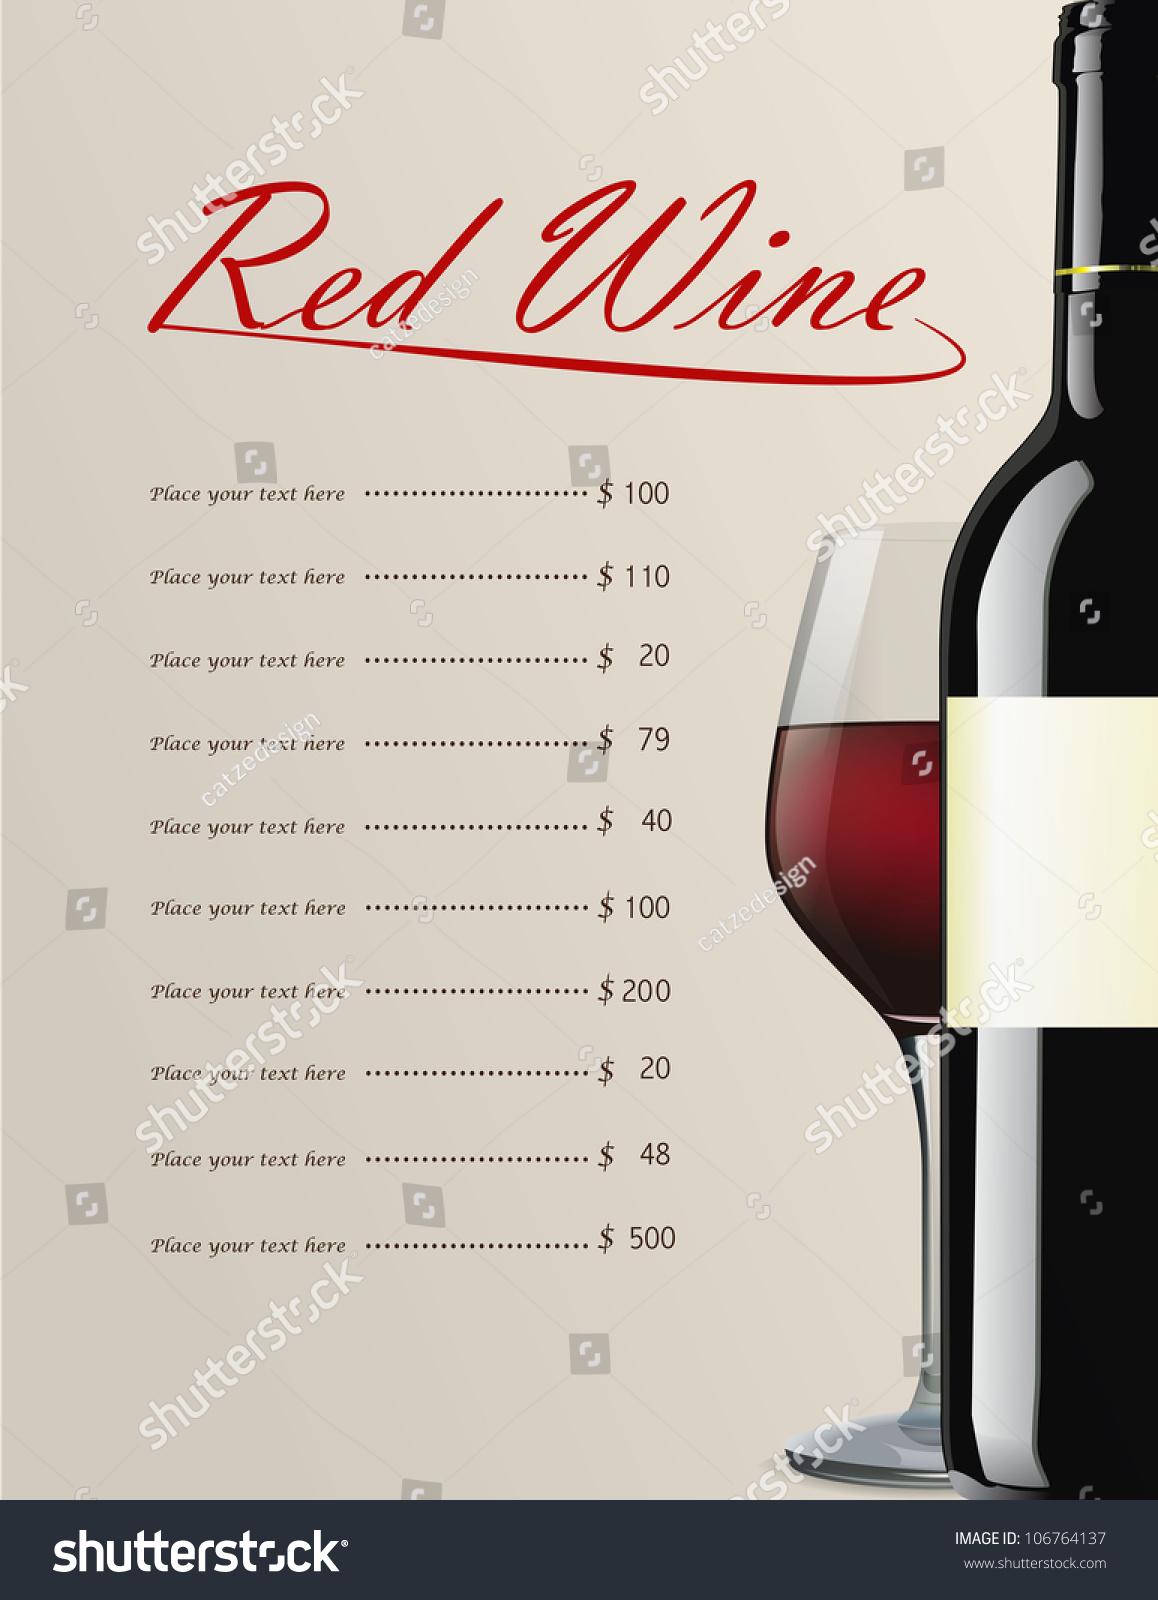 Red Wine Menu Editable Illustration Stock Vector 106764137 Shutterstock